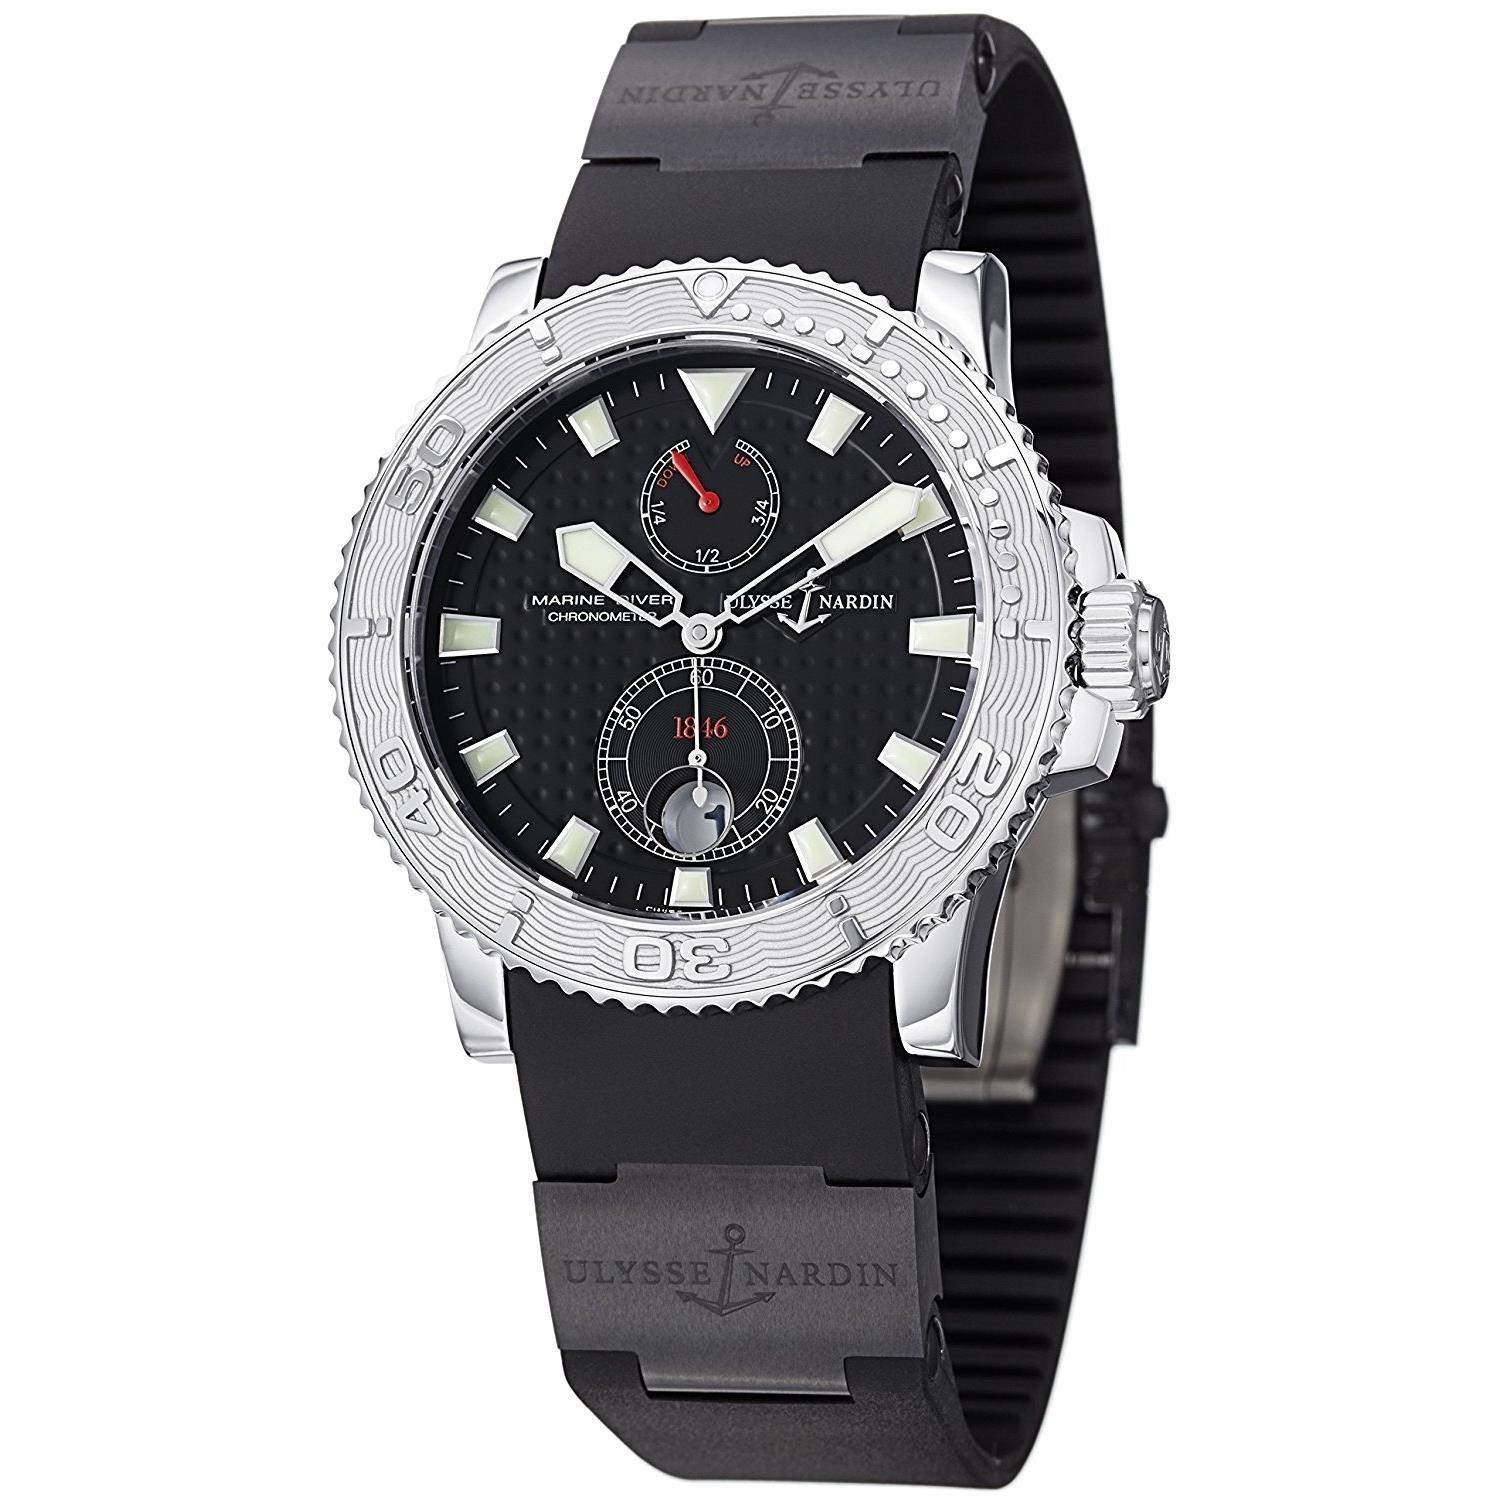 Ulysse Nardin Maxi Marine Diver Chronometer Men's Automatic Black Rubber Strap Watch 263-33-3C/92